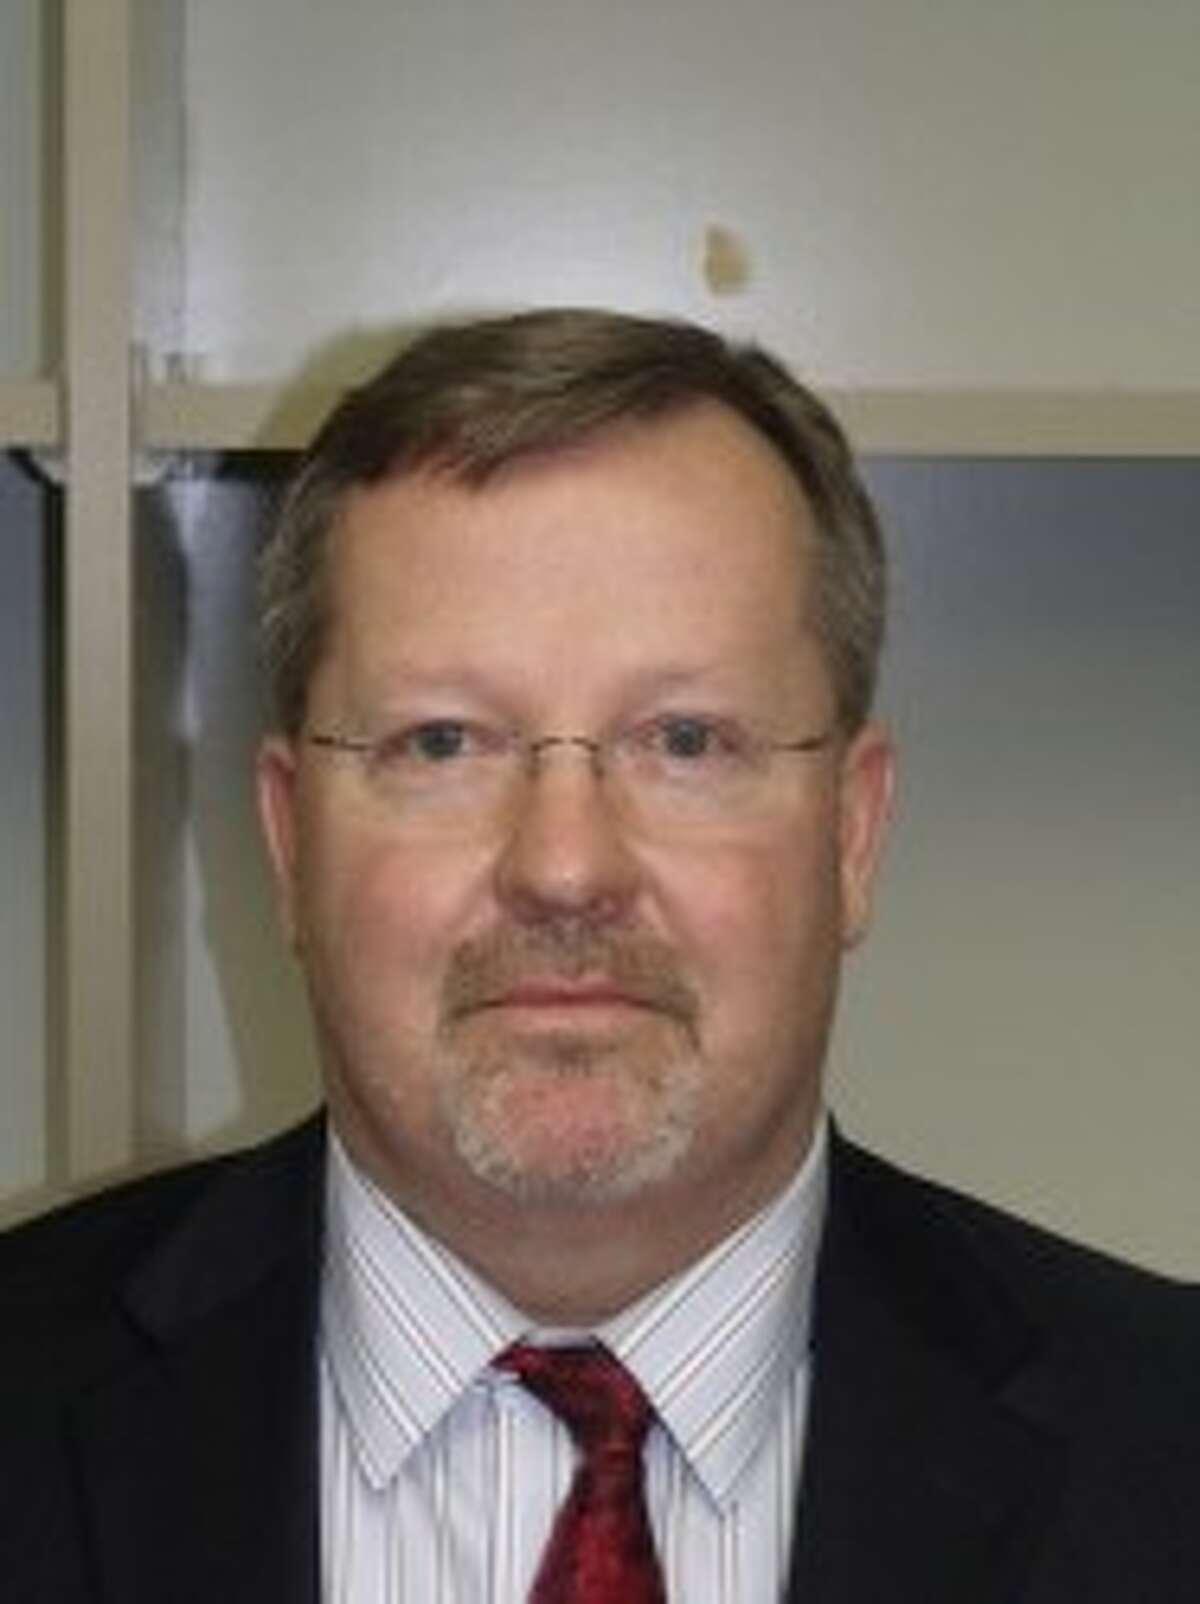 Reed City Area Public Schools Superintendent Steve Westhoff